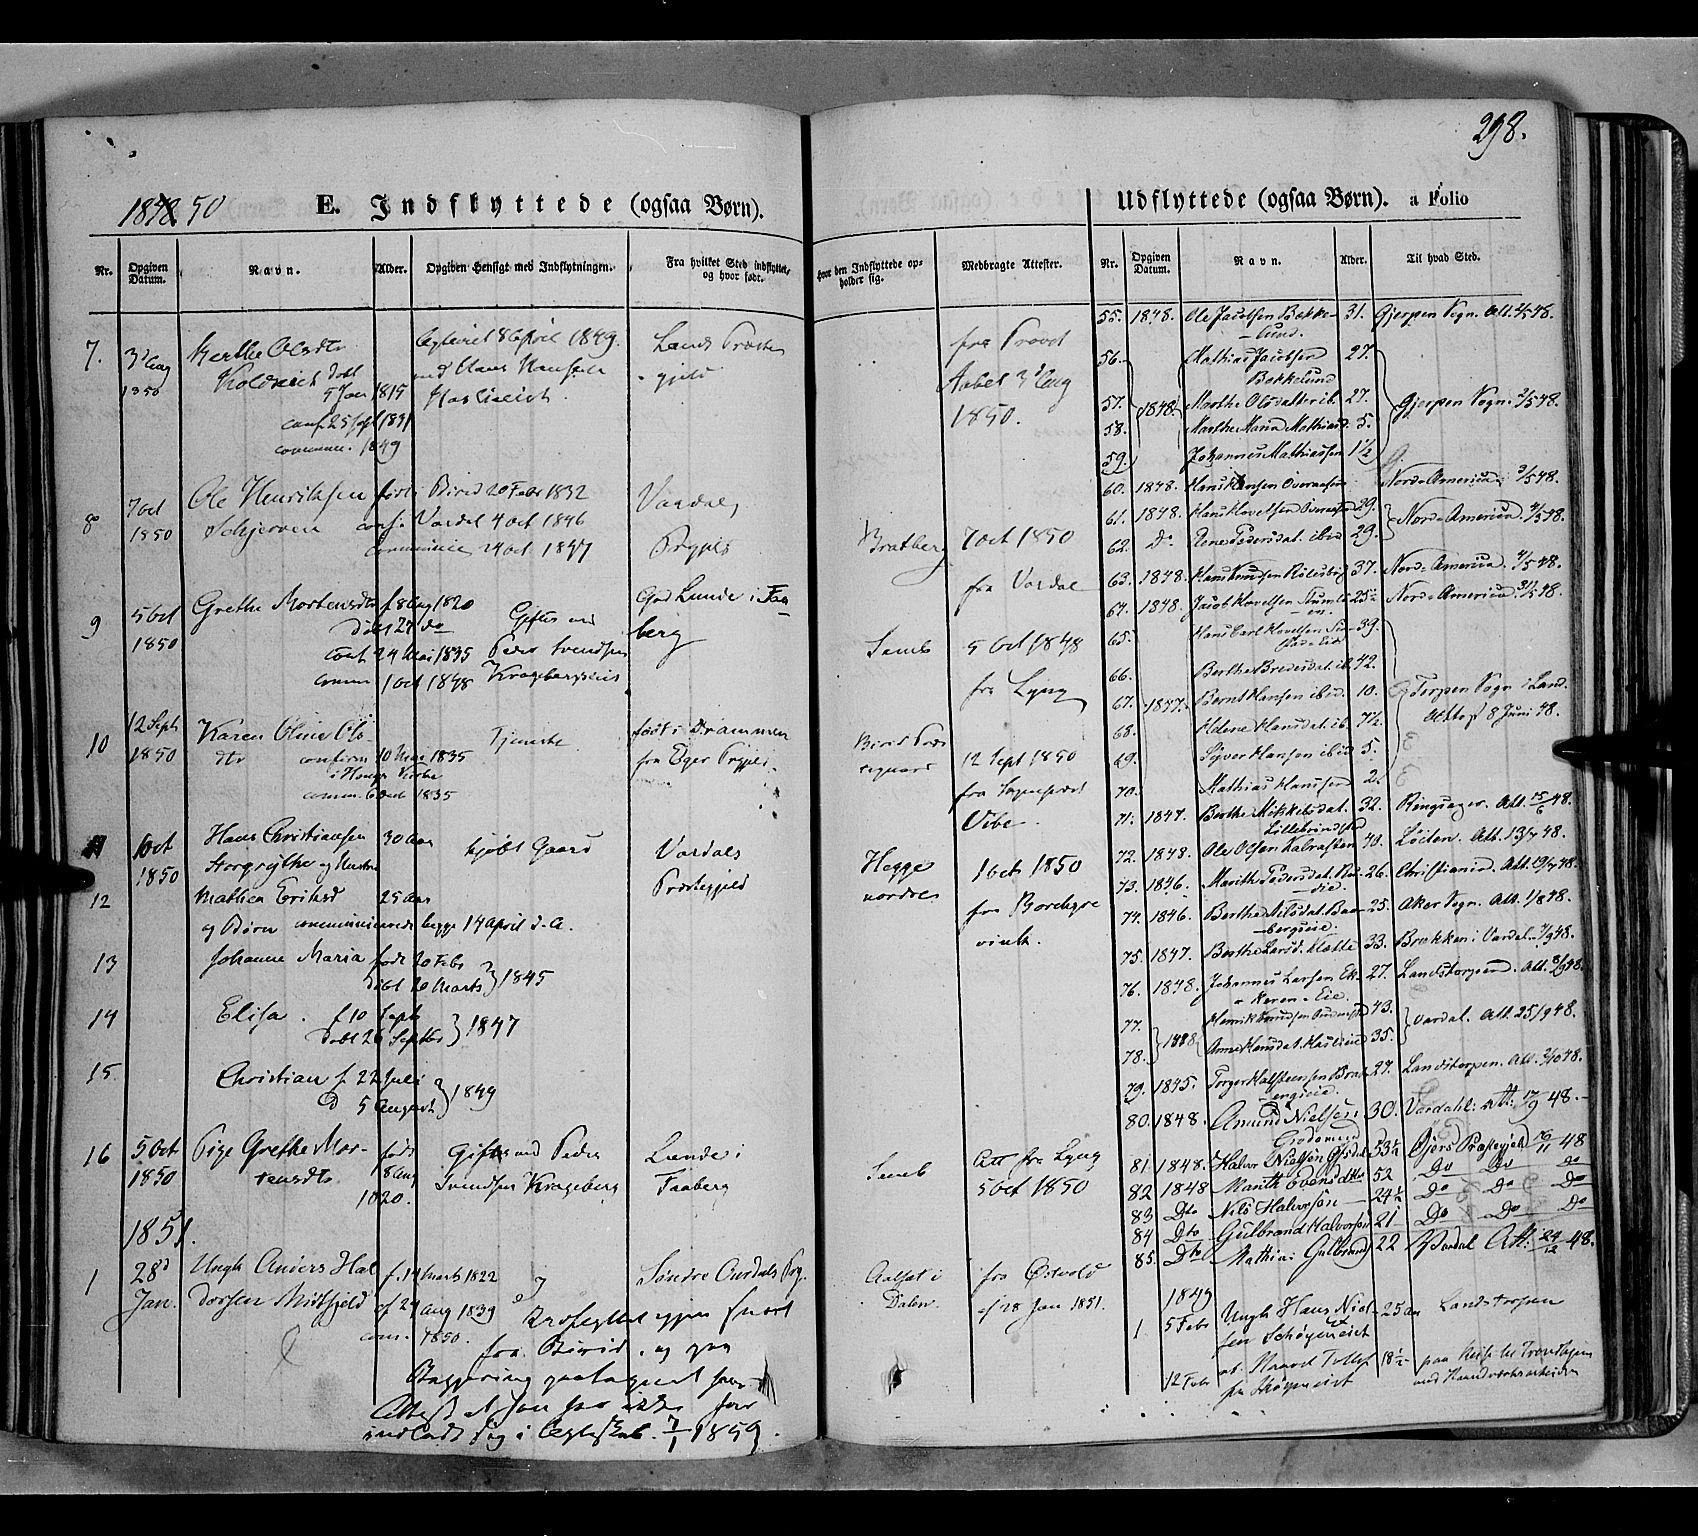 SAH, Biri prestekontor, Ministerialbok nr. 5, 1843-1854, s. 298